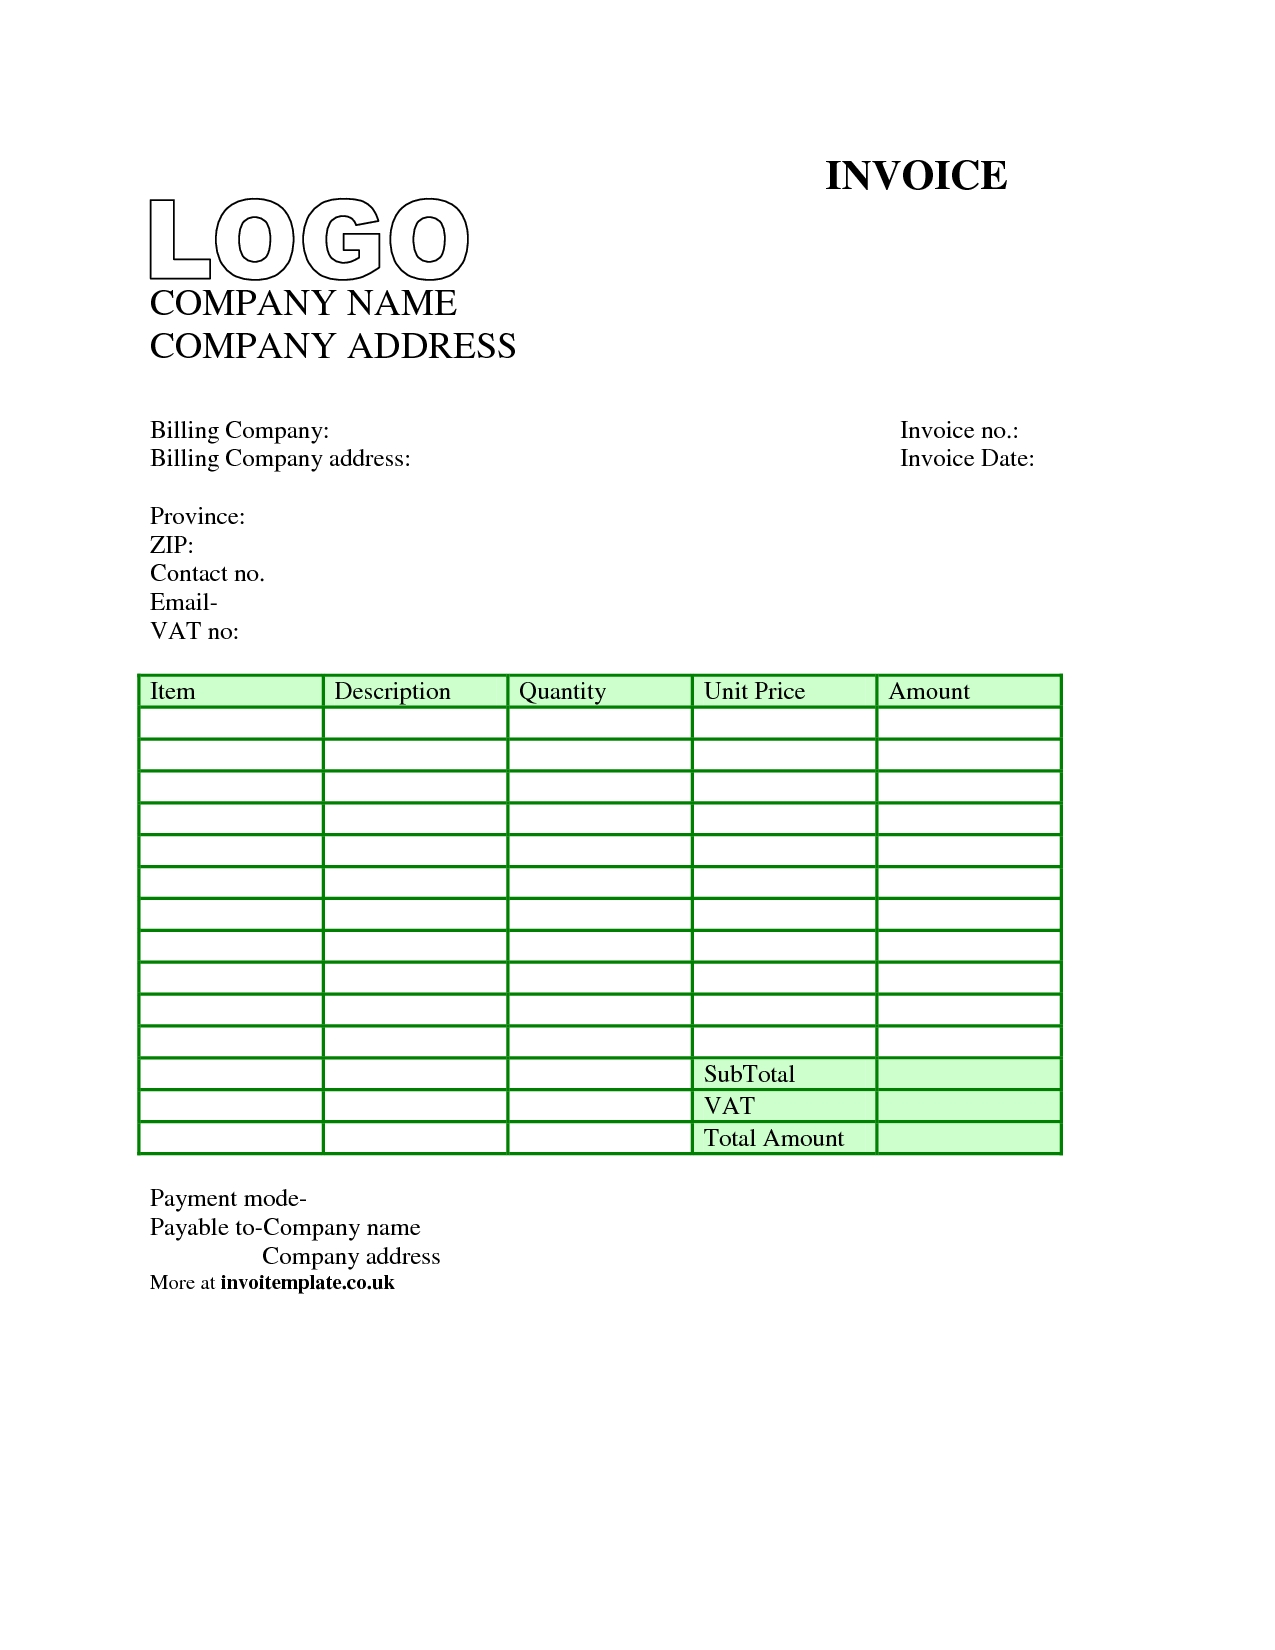 microsoft invoice template uk invoice word free service invoice uk invoice template